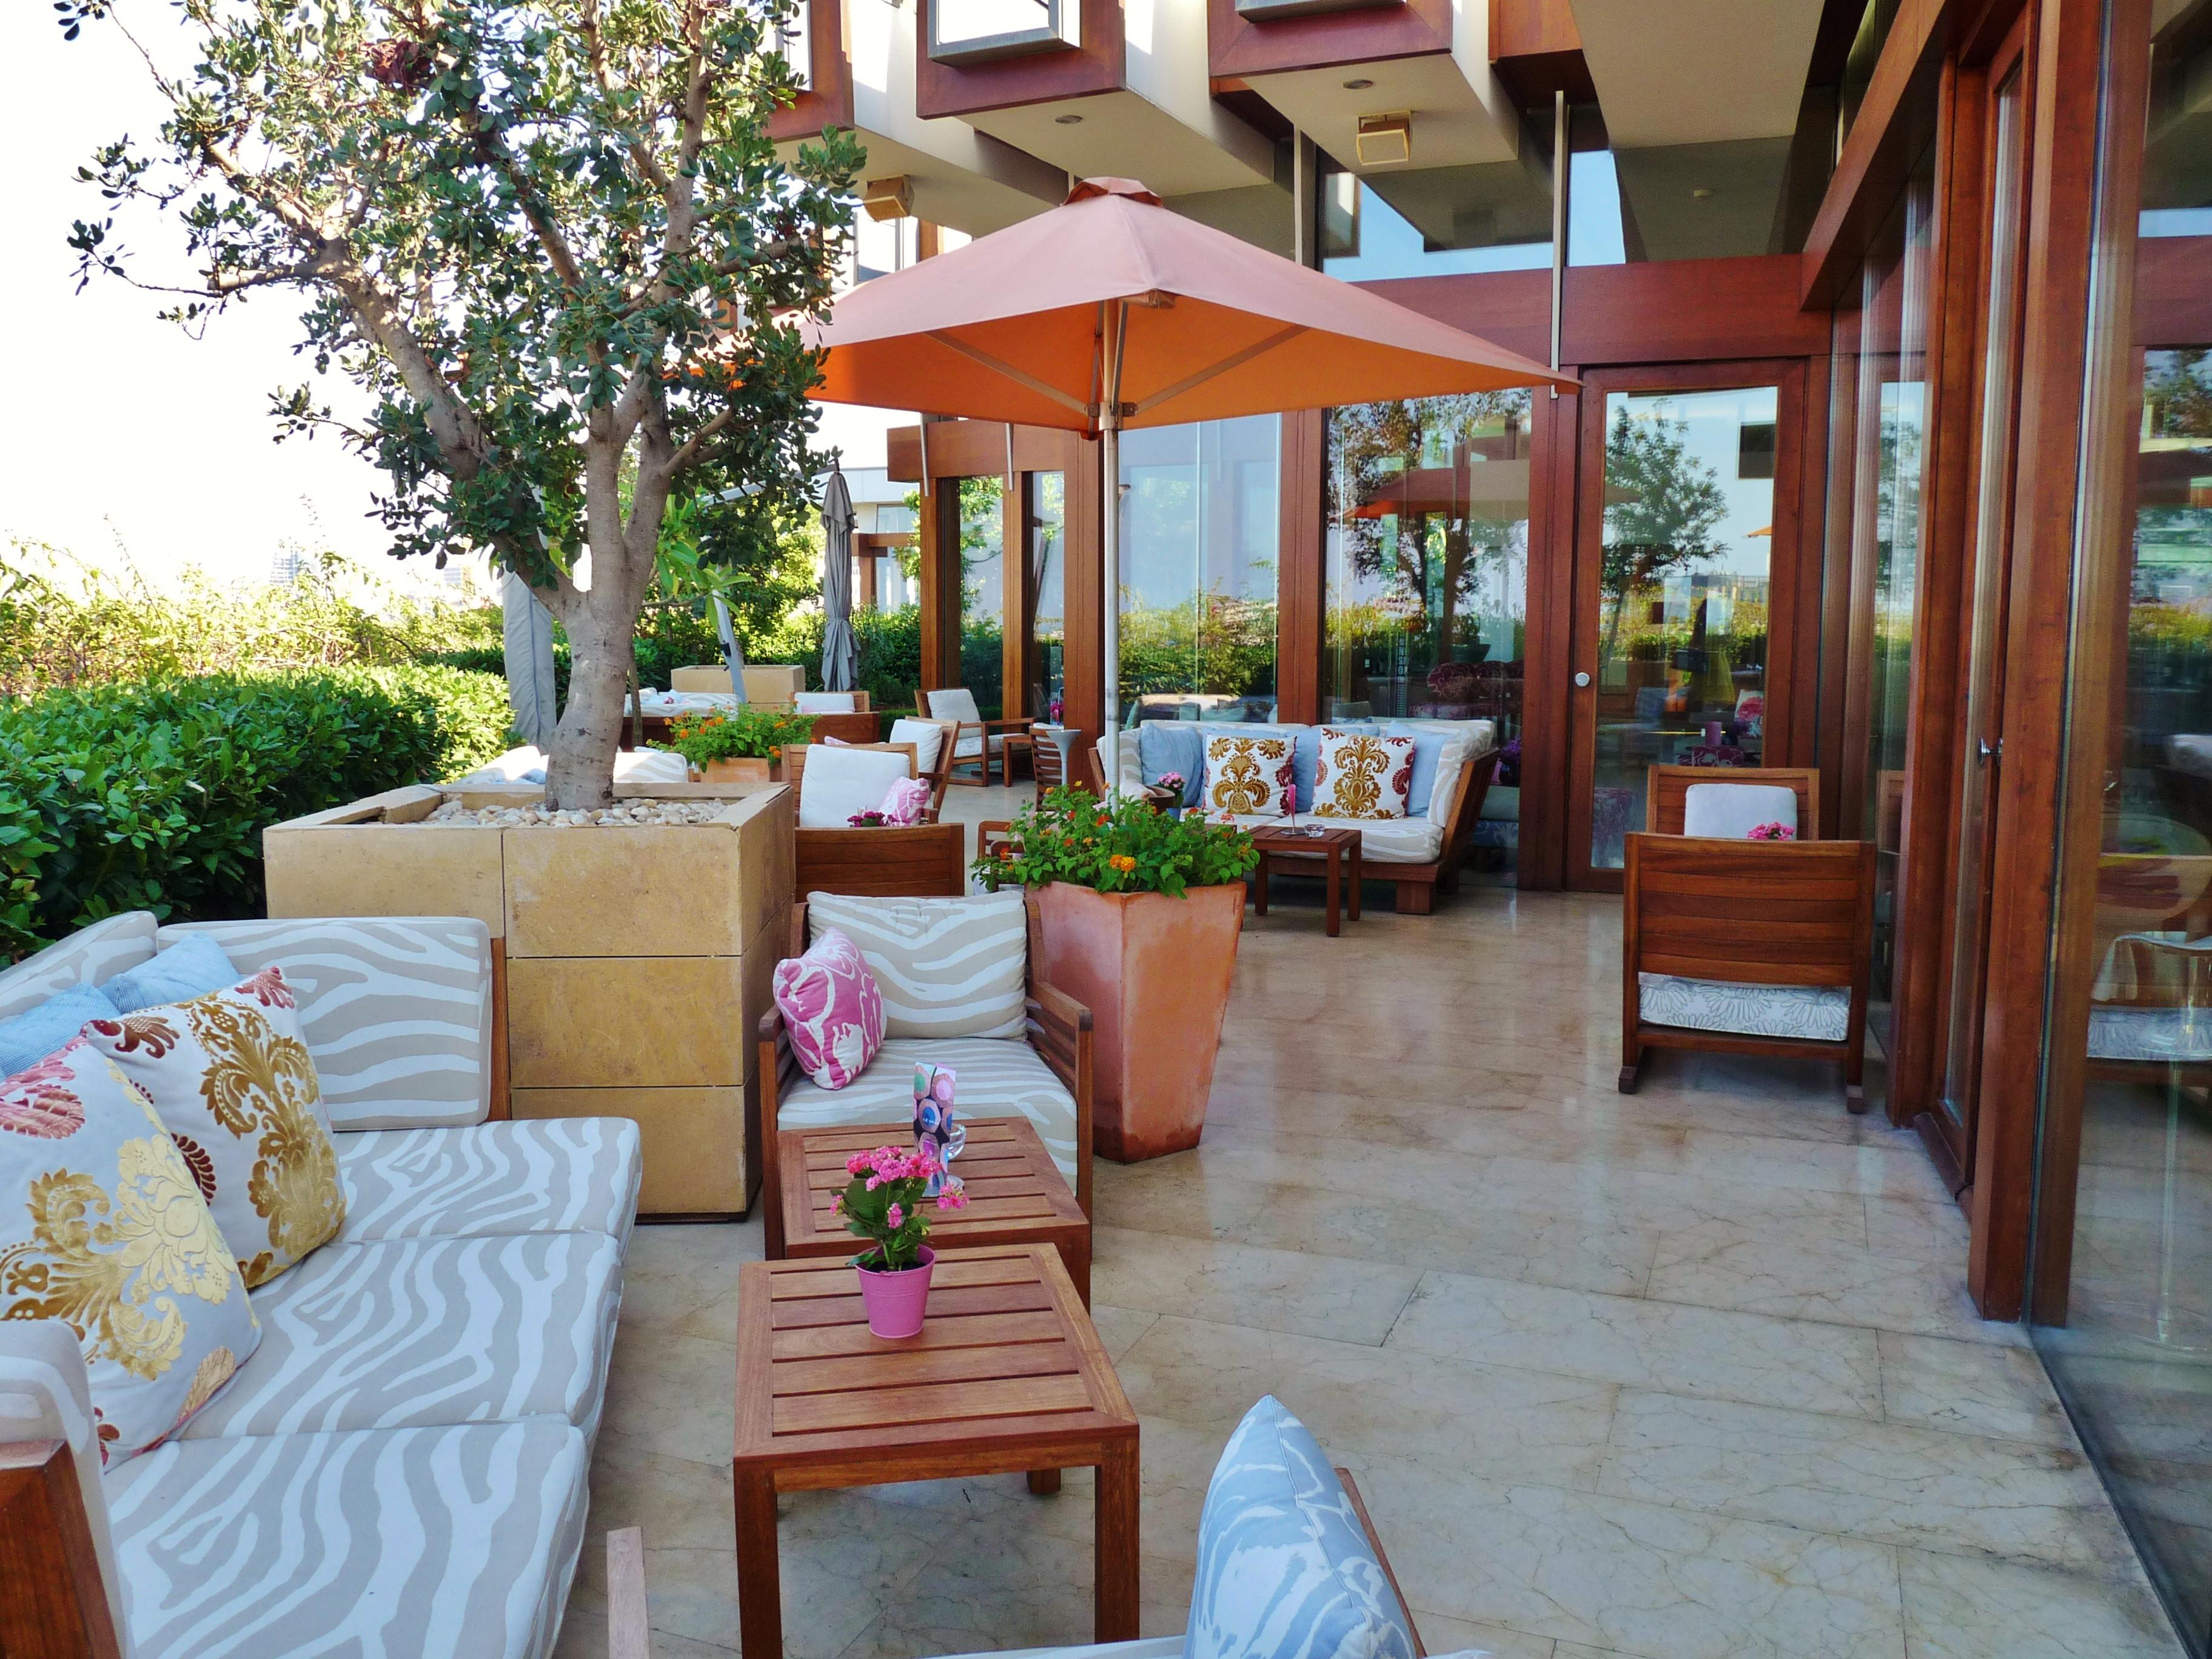 Le gray luxury hotel beirut luxury hotel lebanon le